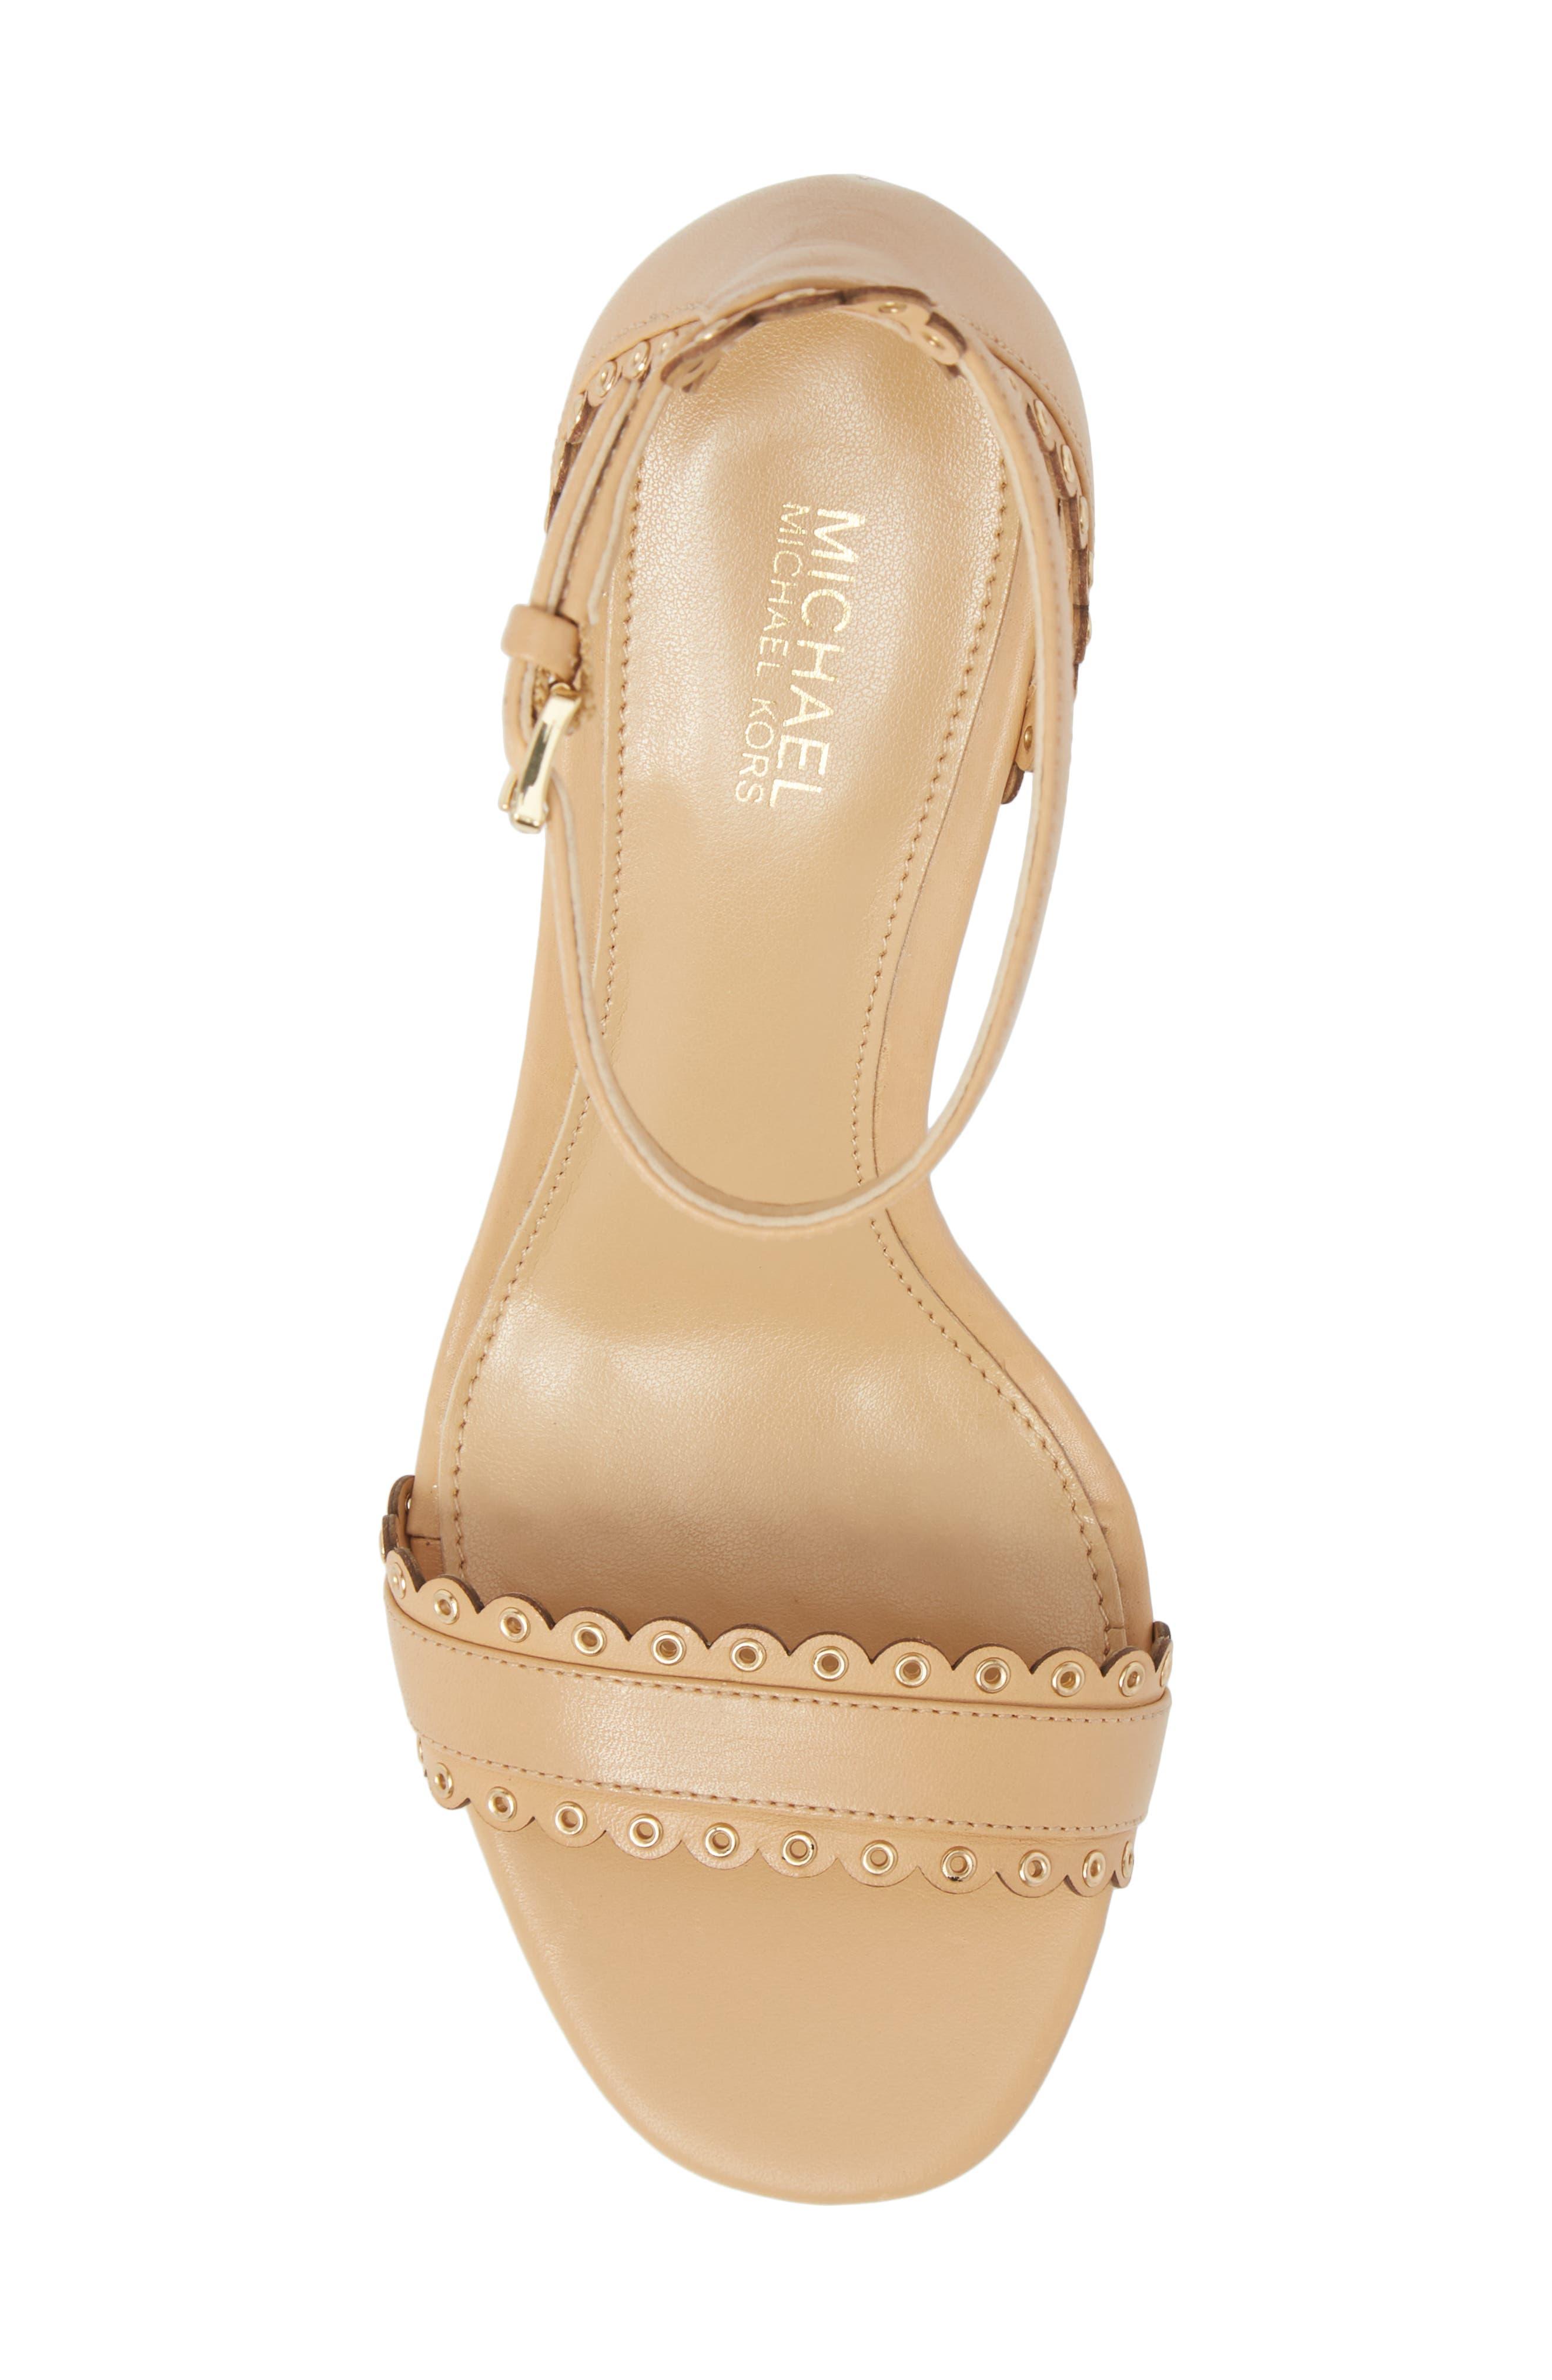 Jessie Sandal,                             Alternate thumbnail 5, color,                             Butternut Leather